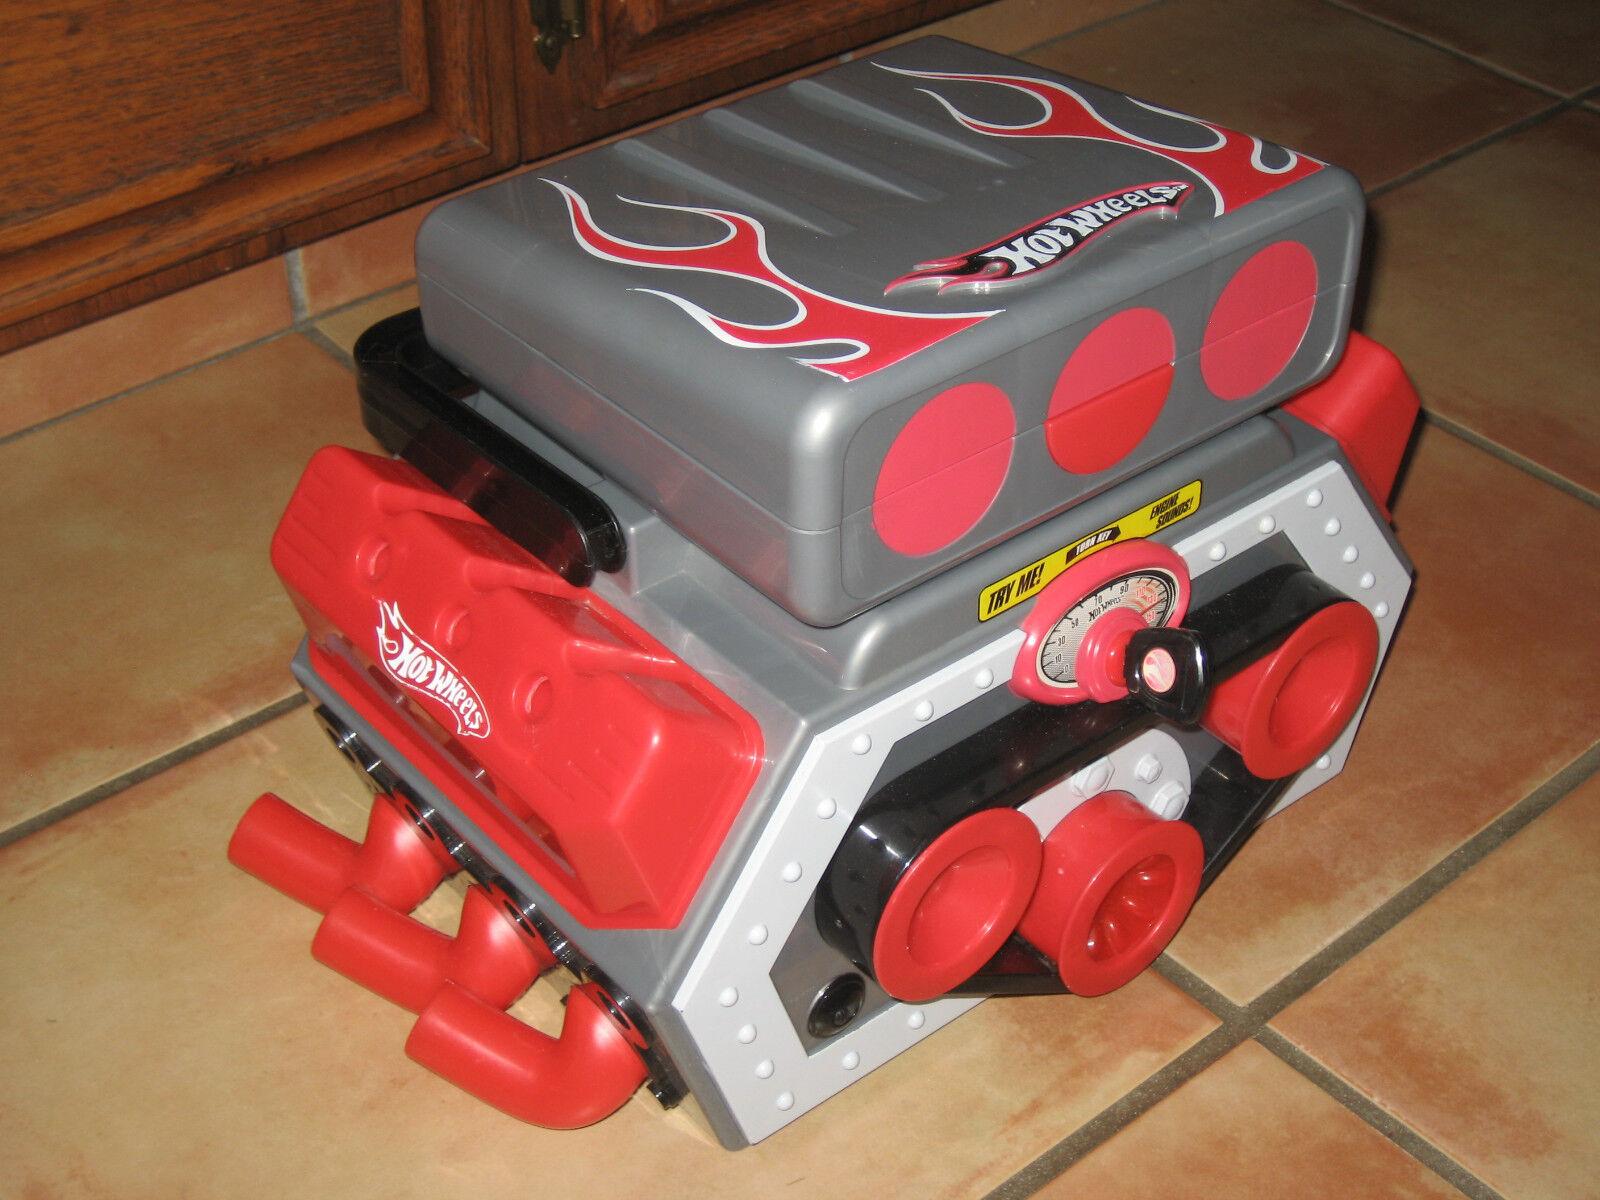 Hot Wheels RARE Race caso de motor, con sonidos de arrastre, 2009-Motor de Arrastre realista